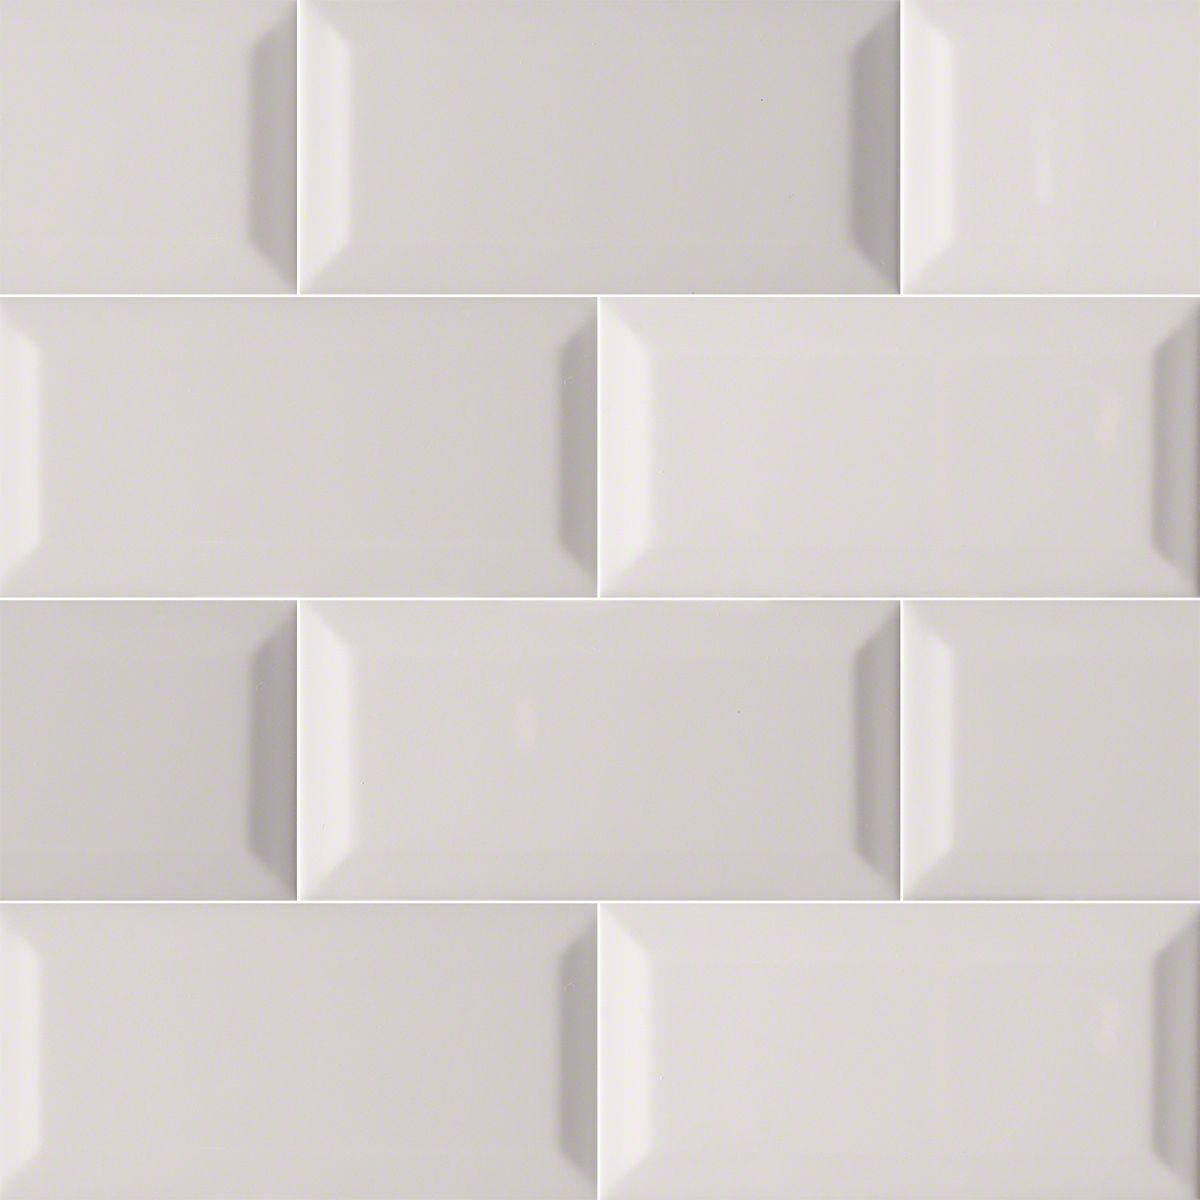 Subway tile gray glossy subway tile 3x6 beveled backsplash subway tile gray glossy subway tile 3x6 beveled dailygadgetfo Images